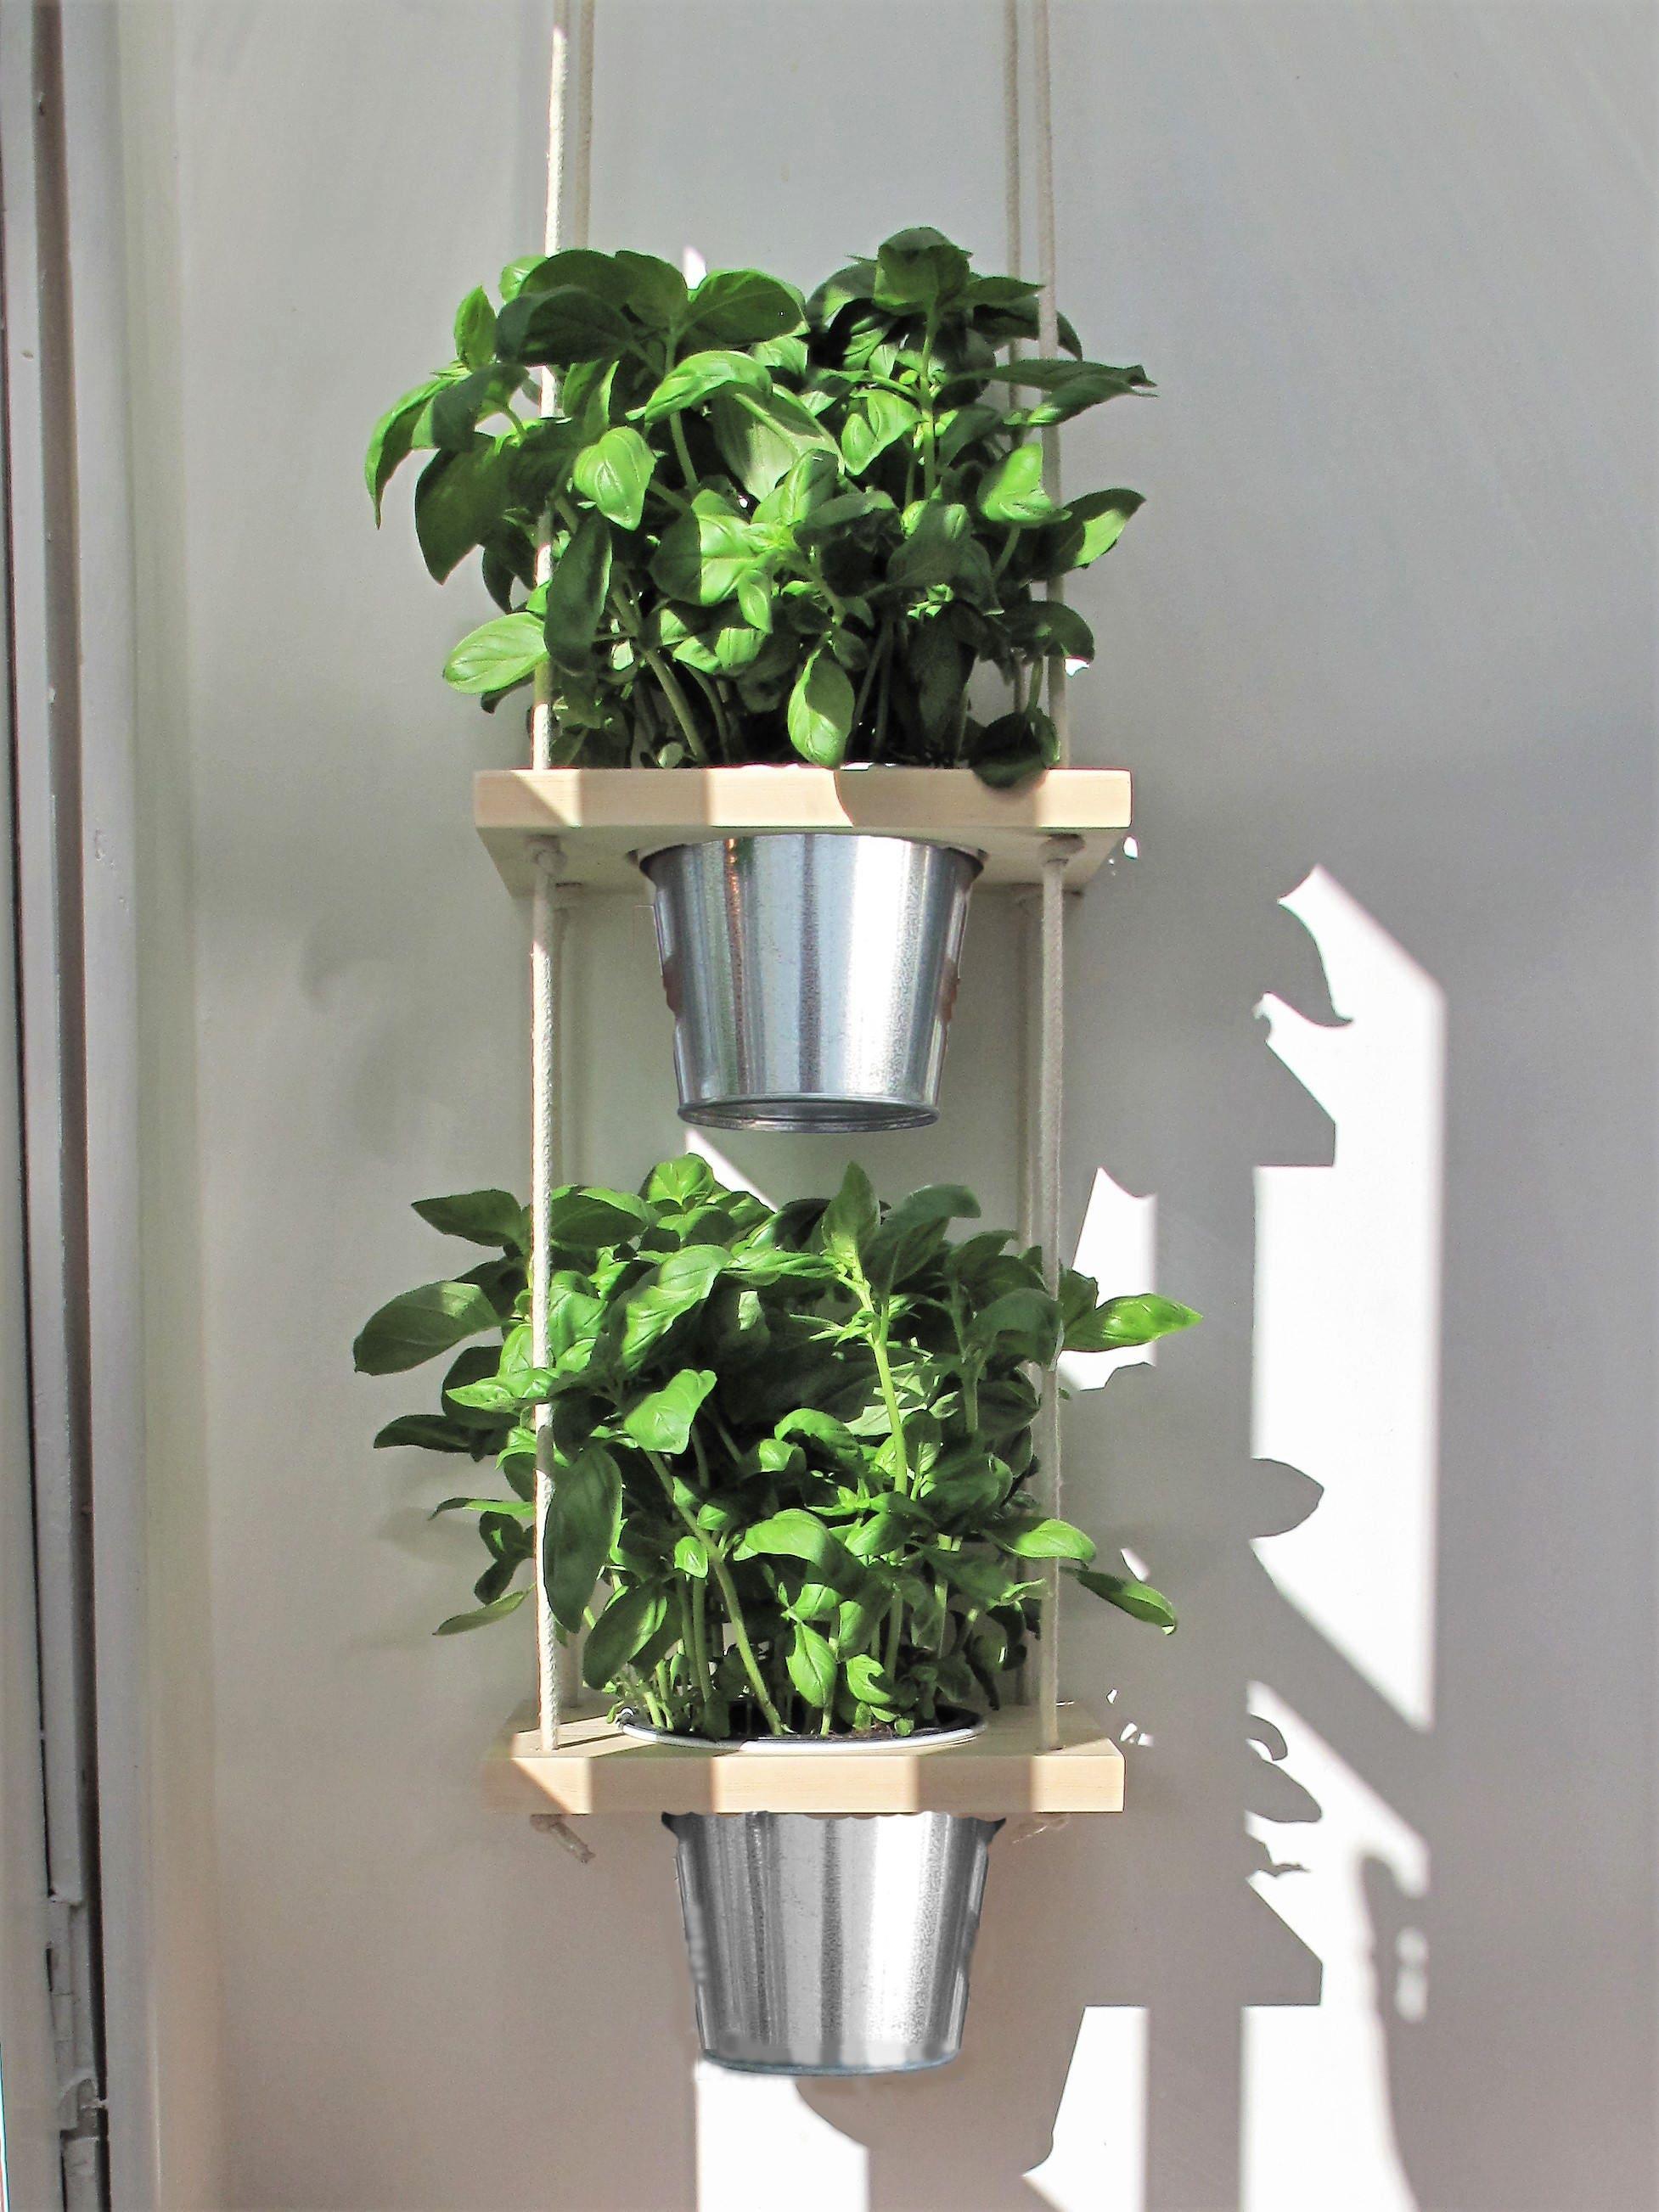 Hanging Herb Planter With Pots Kitchen Herb Garden Etsy